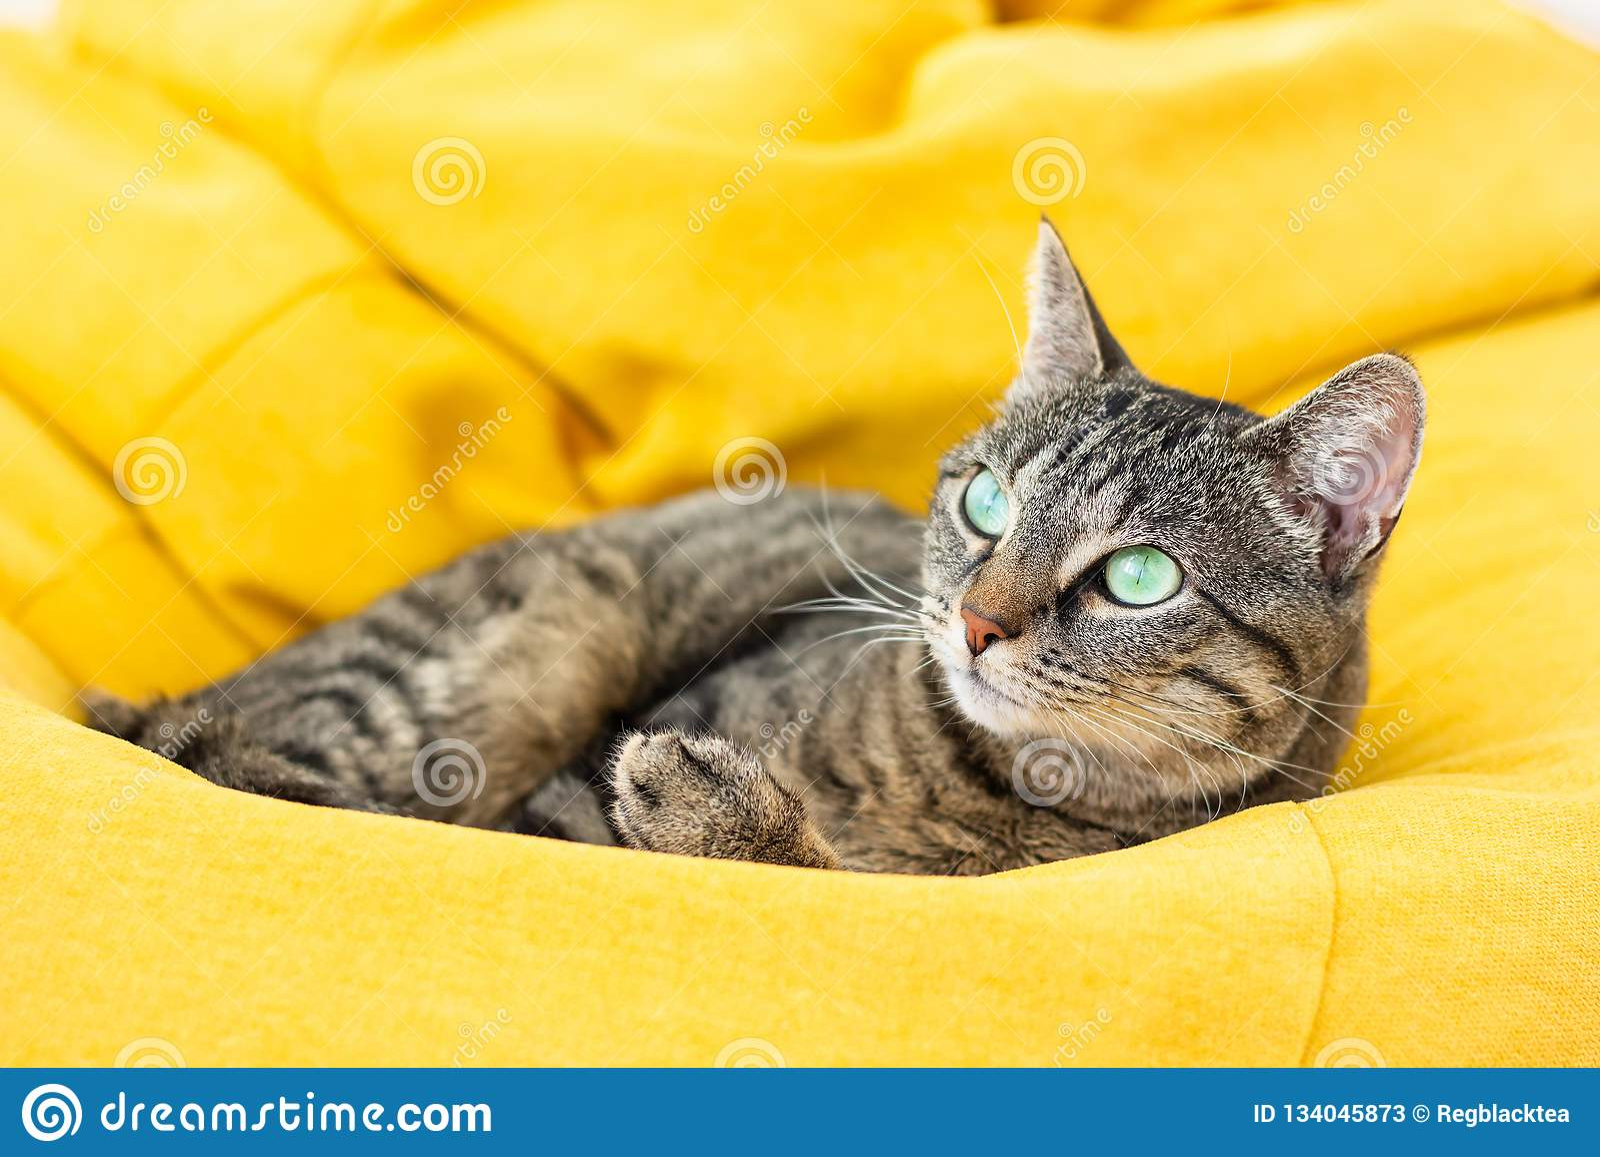 Cute tiger cat lying on bright yellow bean bag.